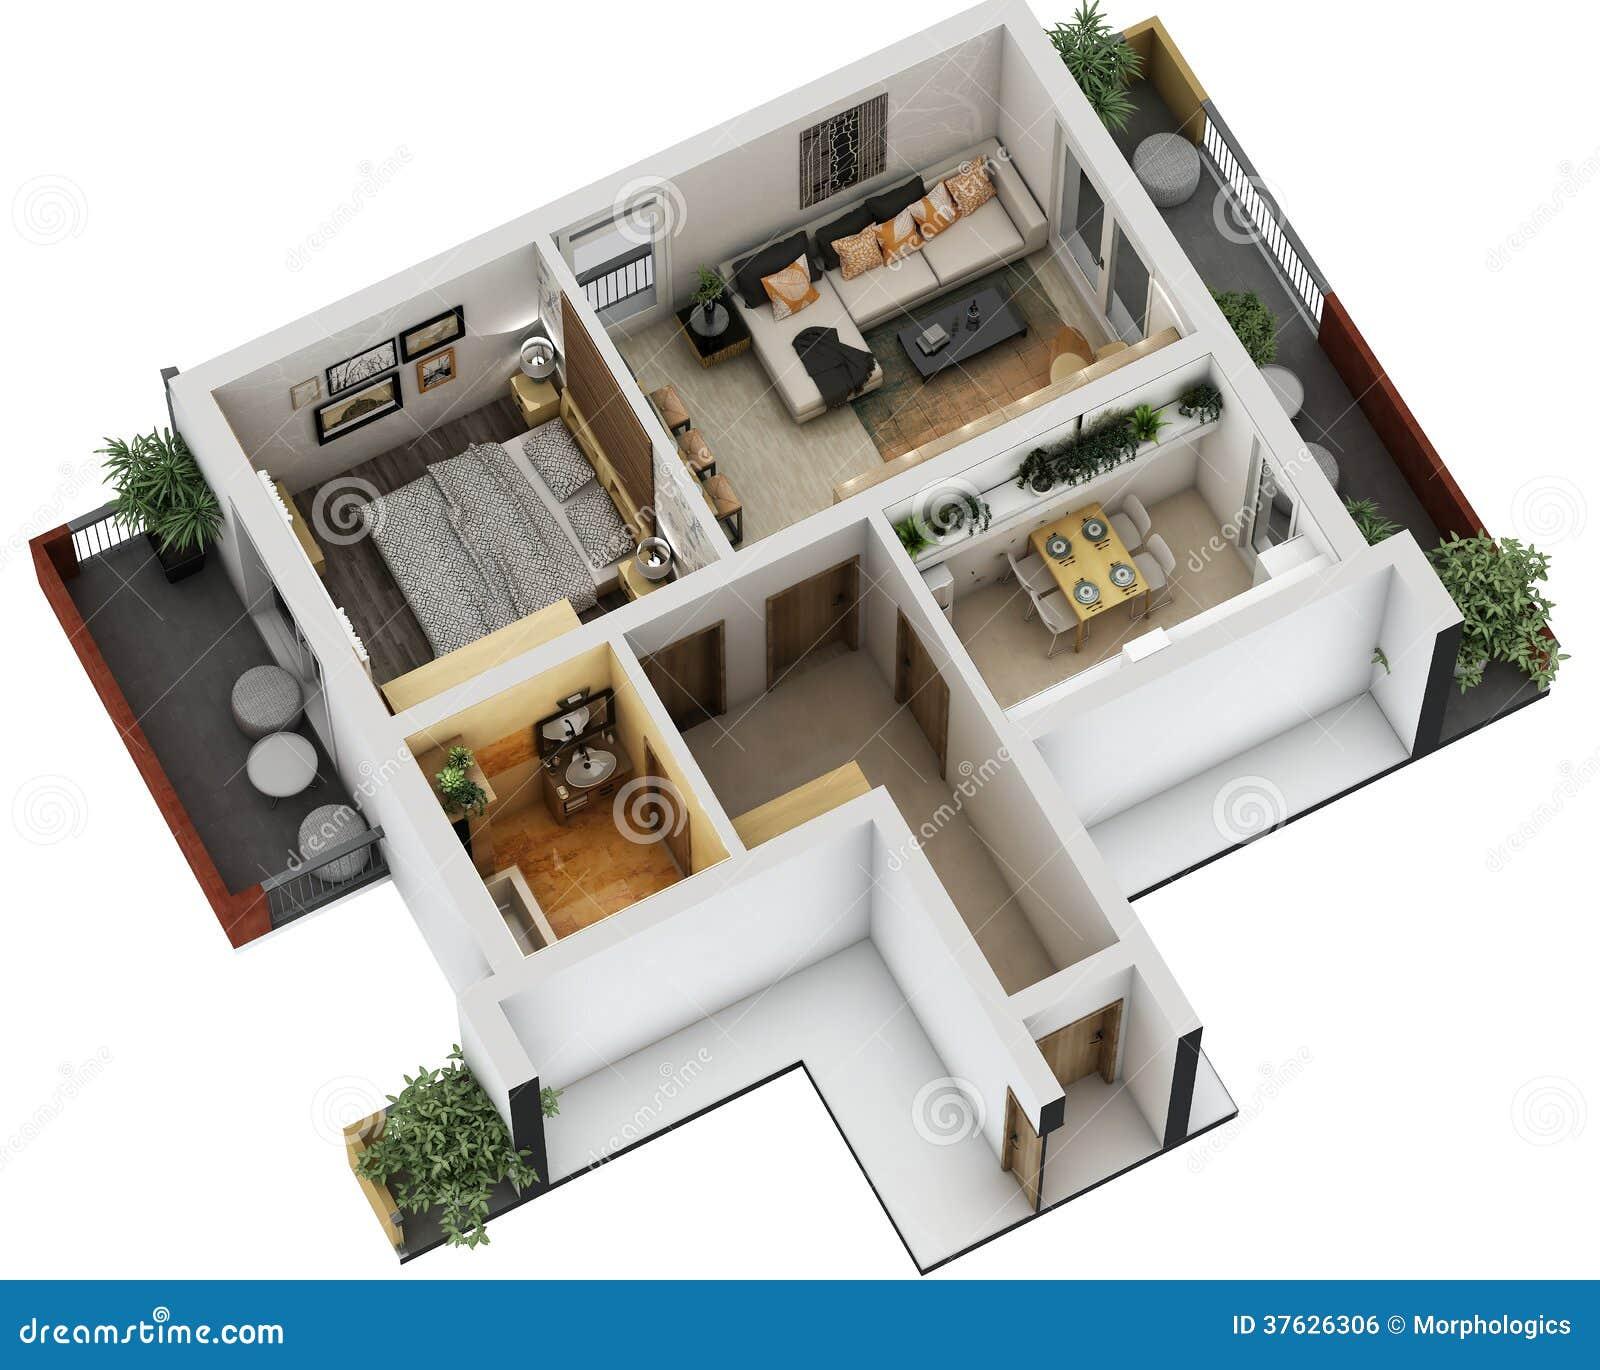 Draw Blueprints Online Free Pianta 3d Immagine Stock Libera Da Diritti Immagine